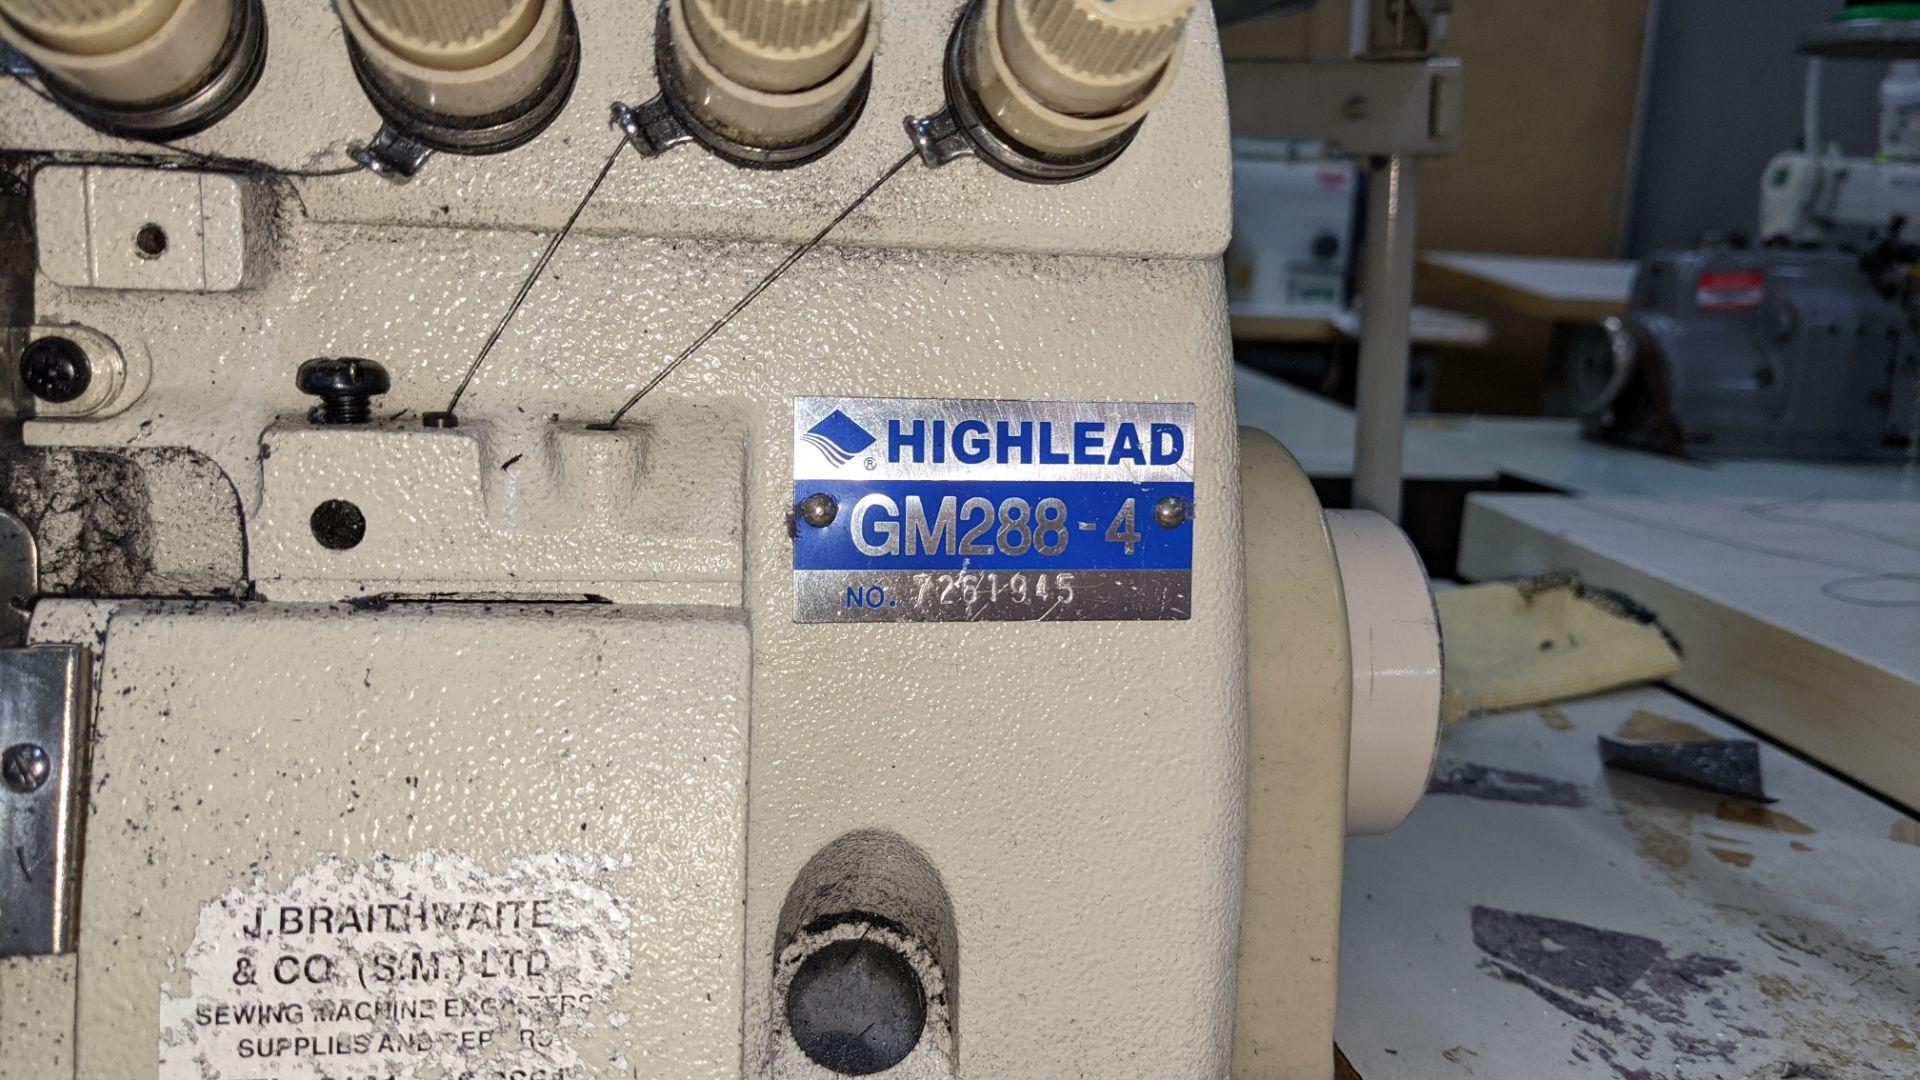 Highlead overlocker model GM288-4 - Image 8 of 16